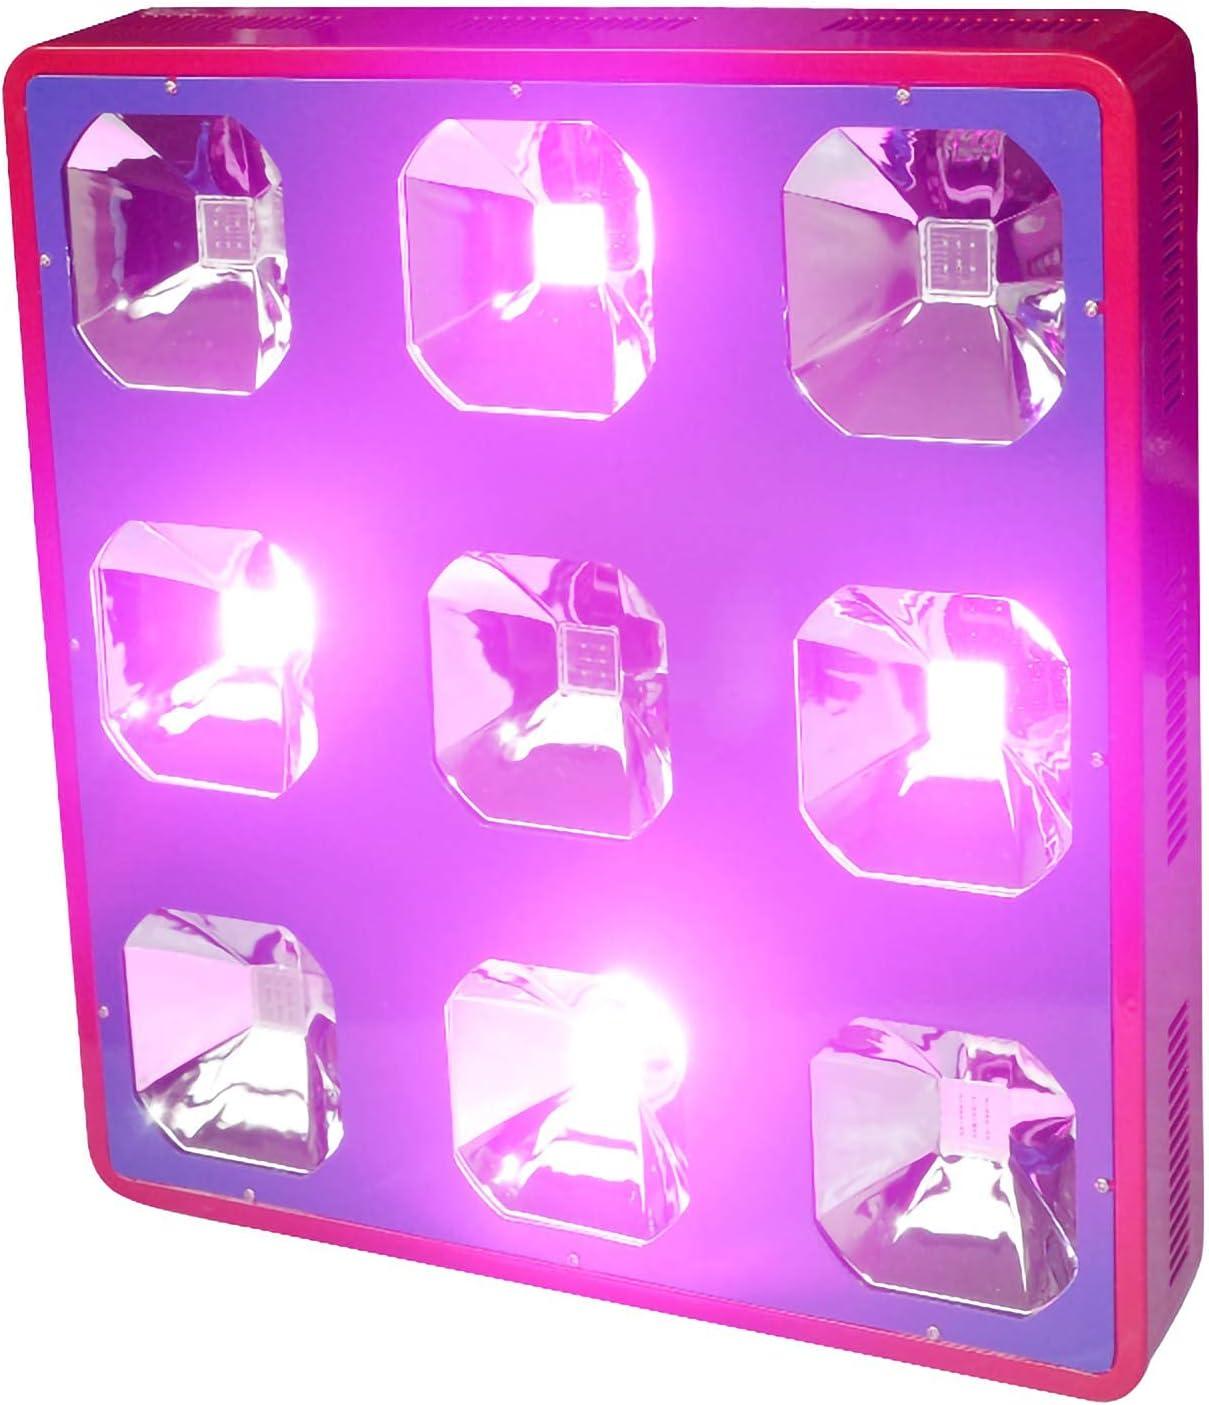 500W Led Grow Light Interior Full Spectrum Plant Growing Light Lámpara De Cultivo De Doble Interruptor, para Invernaderos De Flores, Huerto Y Tienda De Cultivo